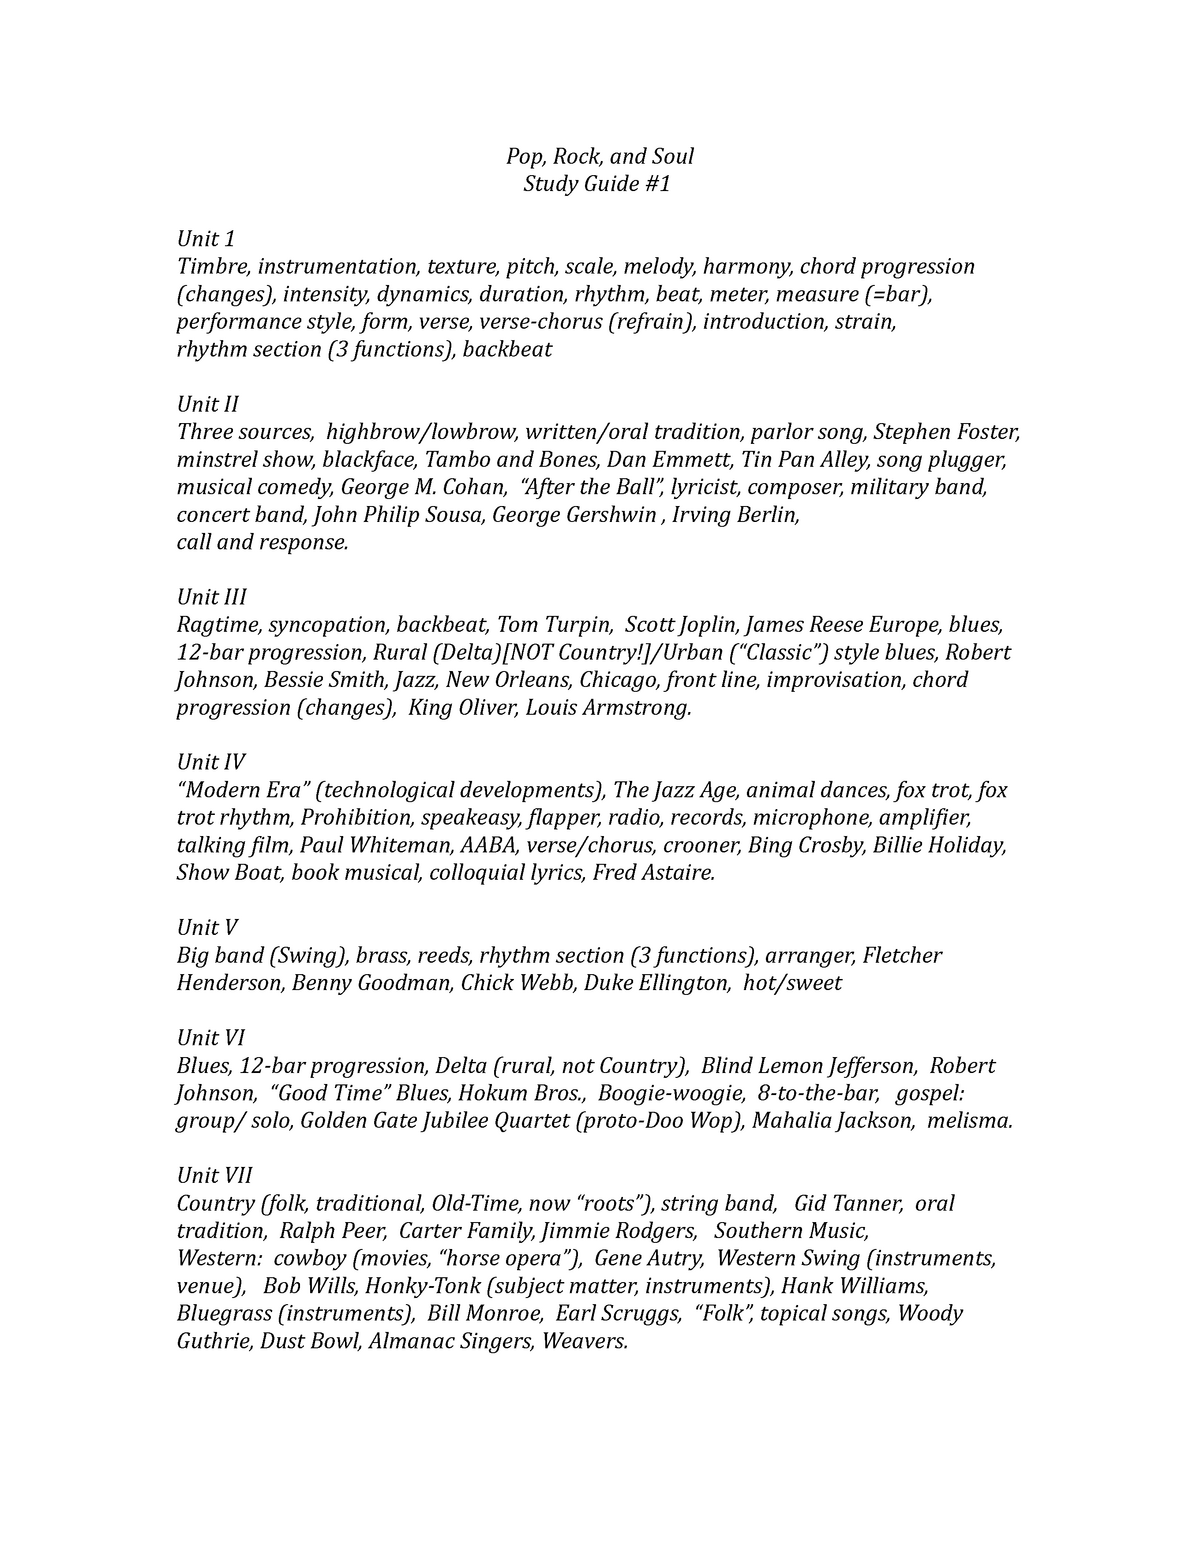 Summary MUS 115 MUS 115 13 Jun 2018 - StuDocu